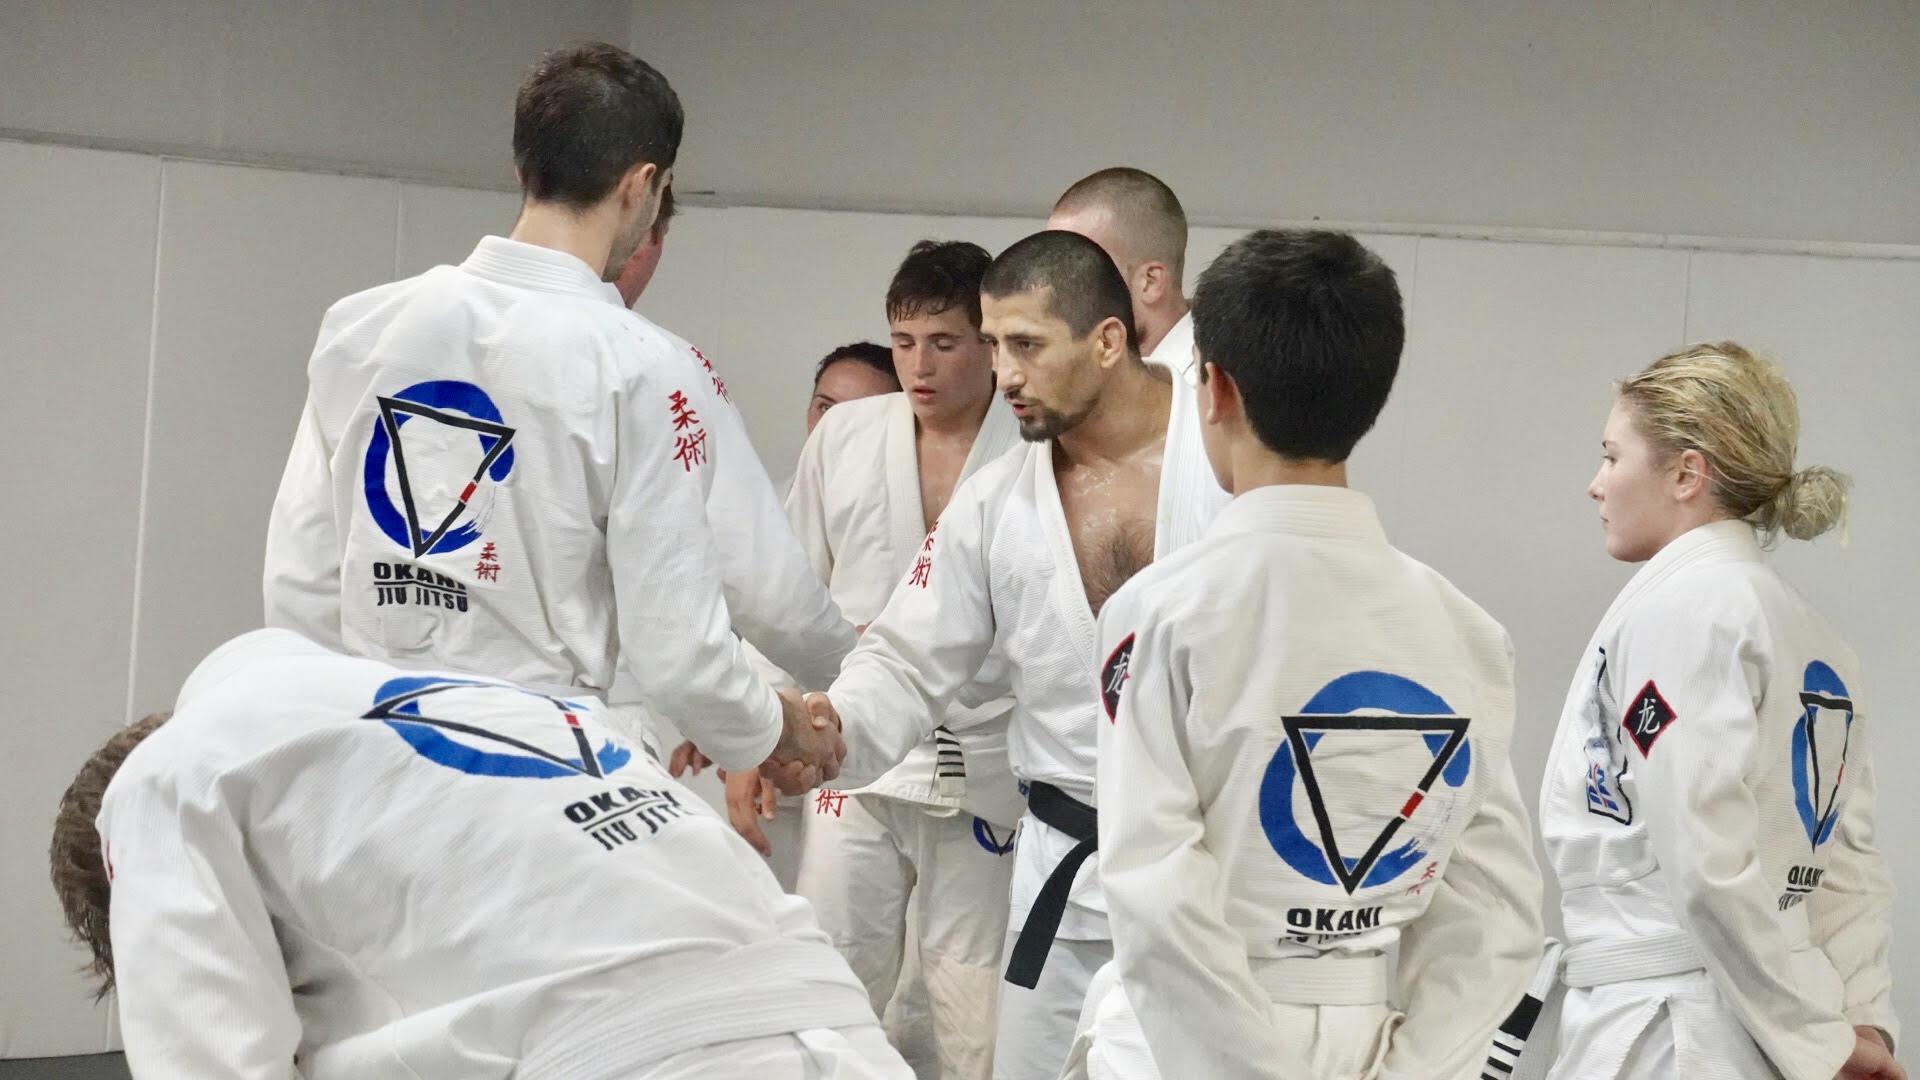 OZFit Brazilian Jiu Jitsu Classes in Bergen County - Gym in Waldwick NJ (4).jpg